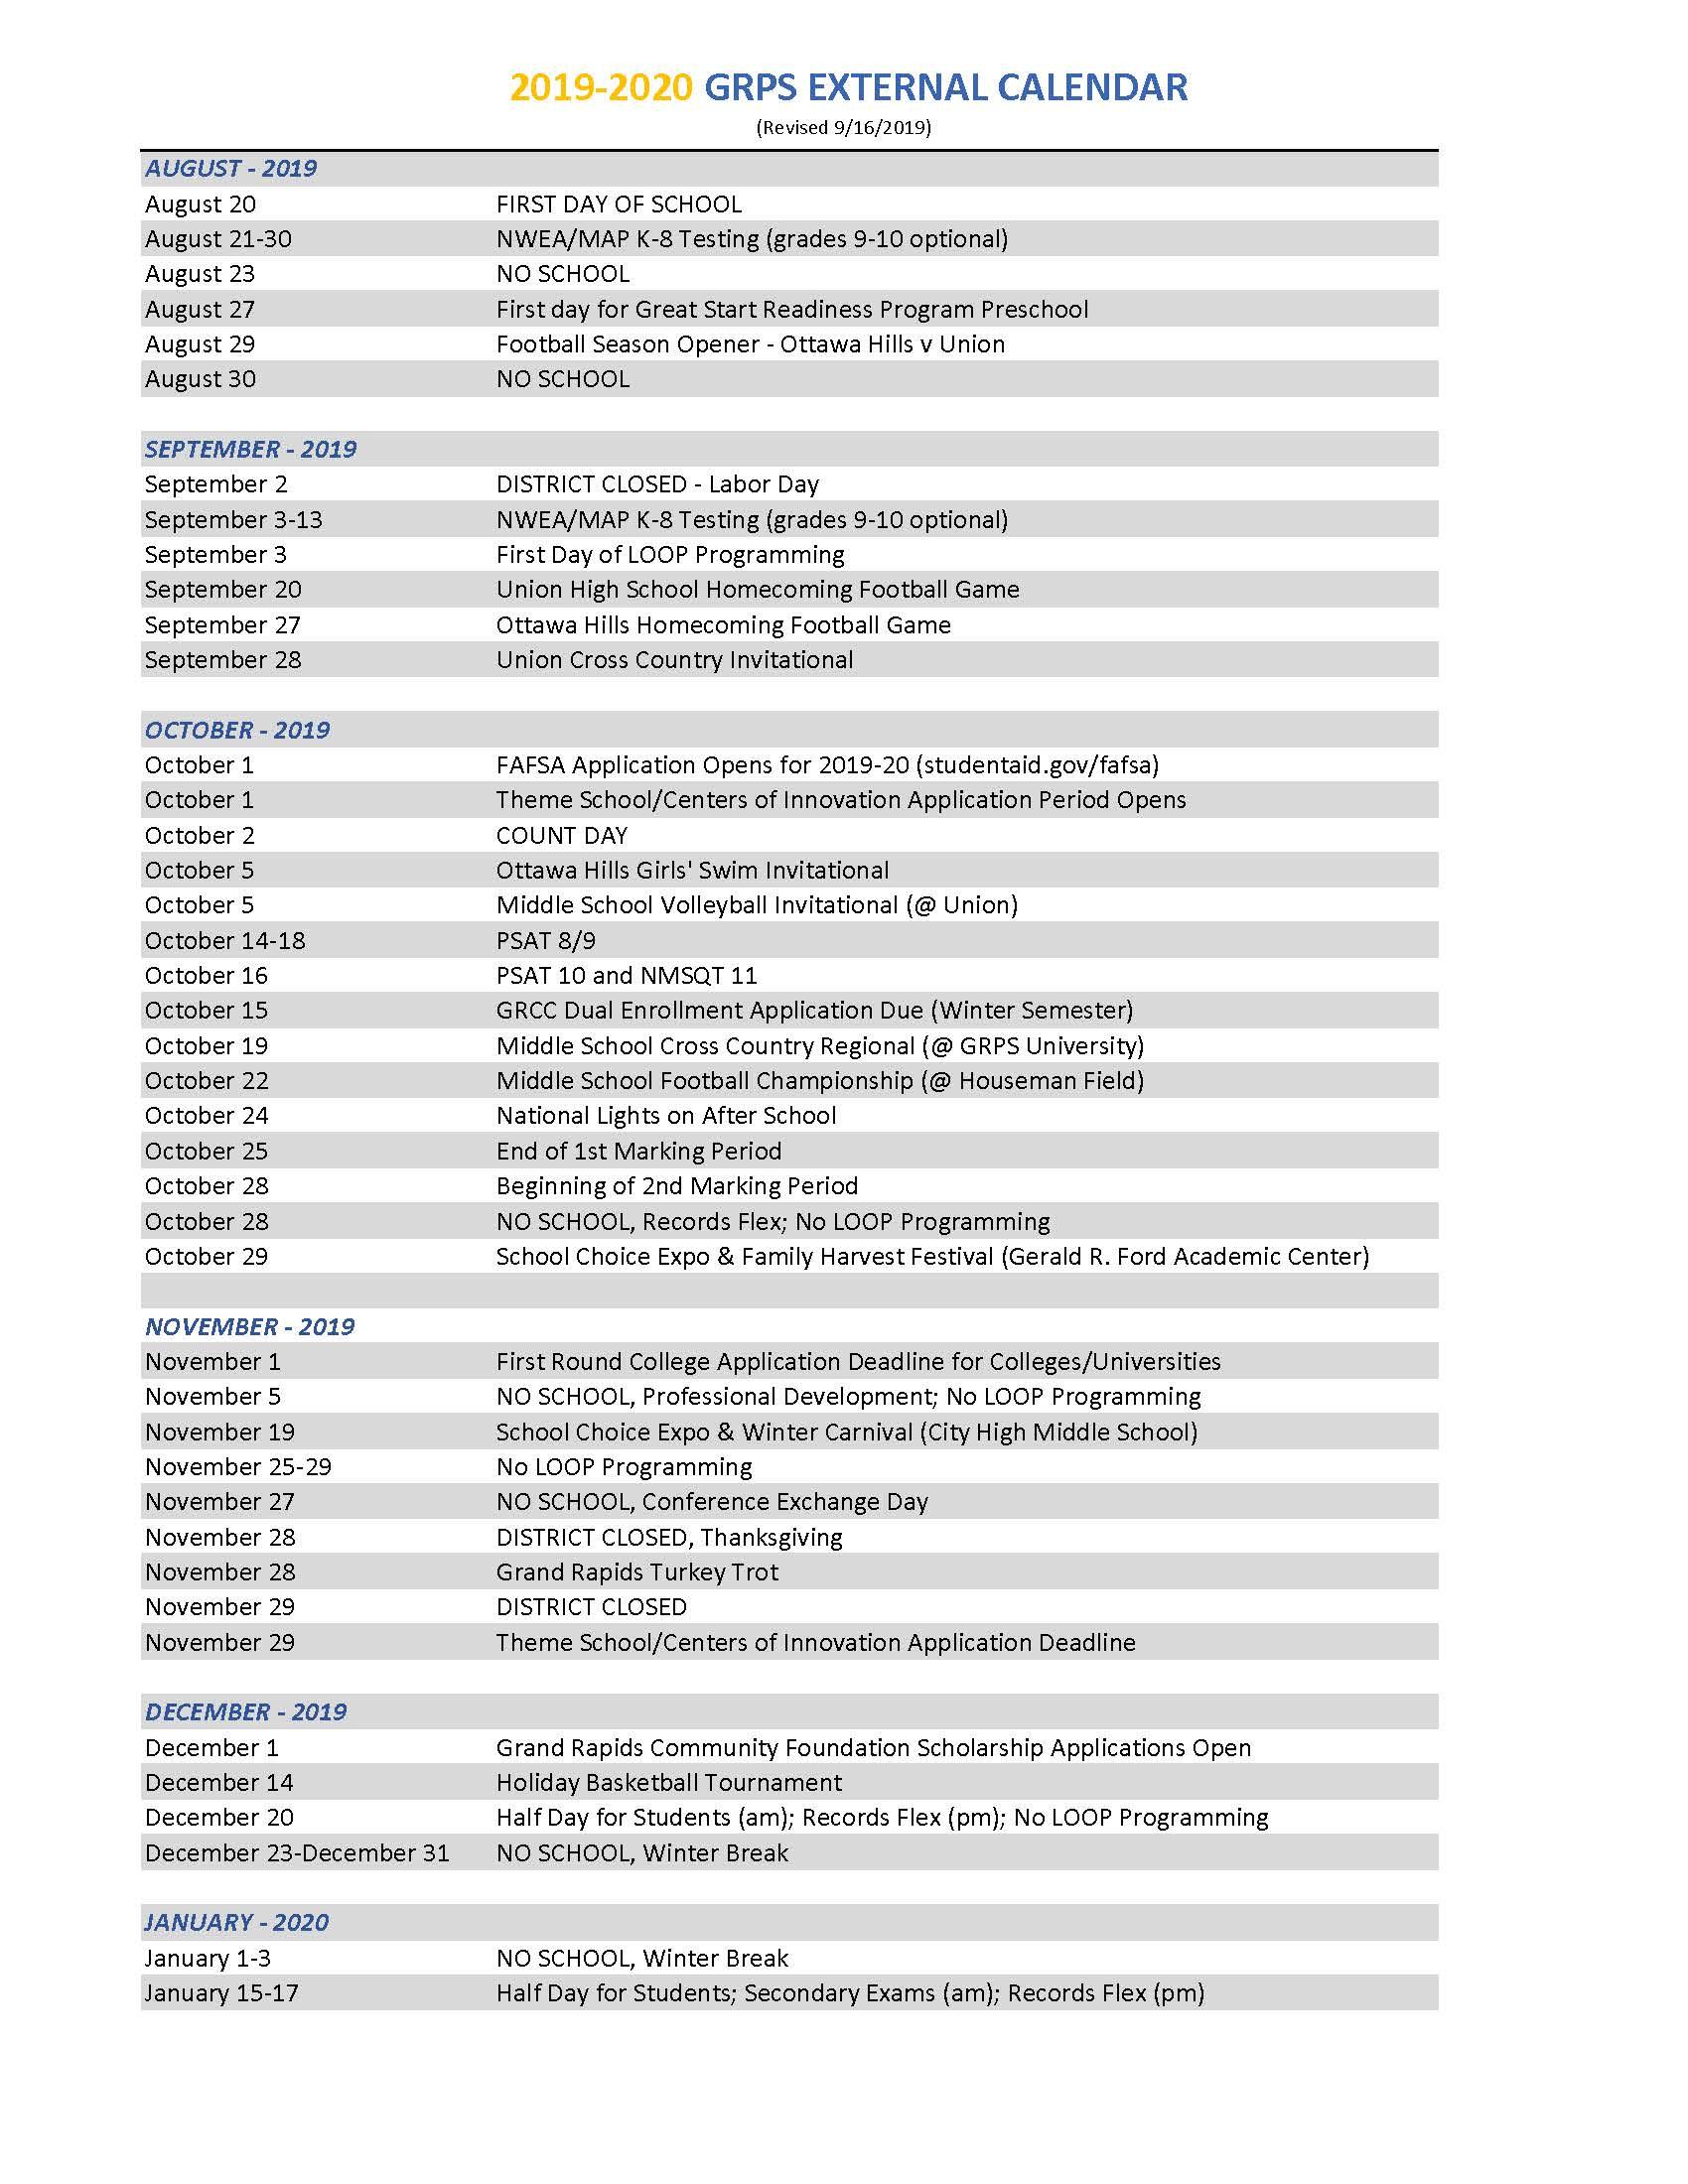 2019-2020 District Calendar with regard to Grandrapidspublicschoolscalendar